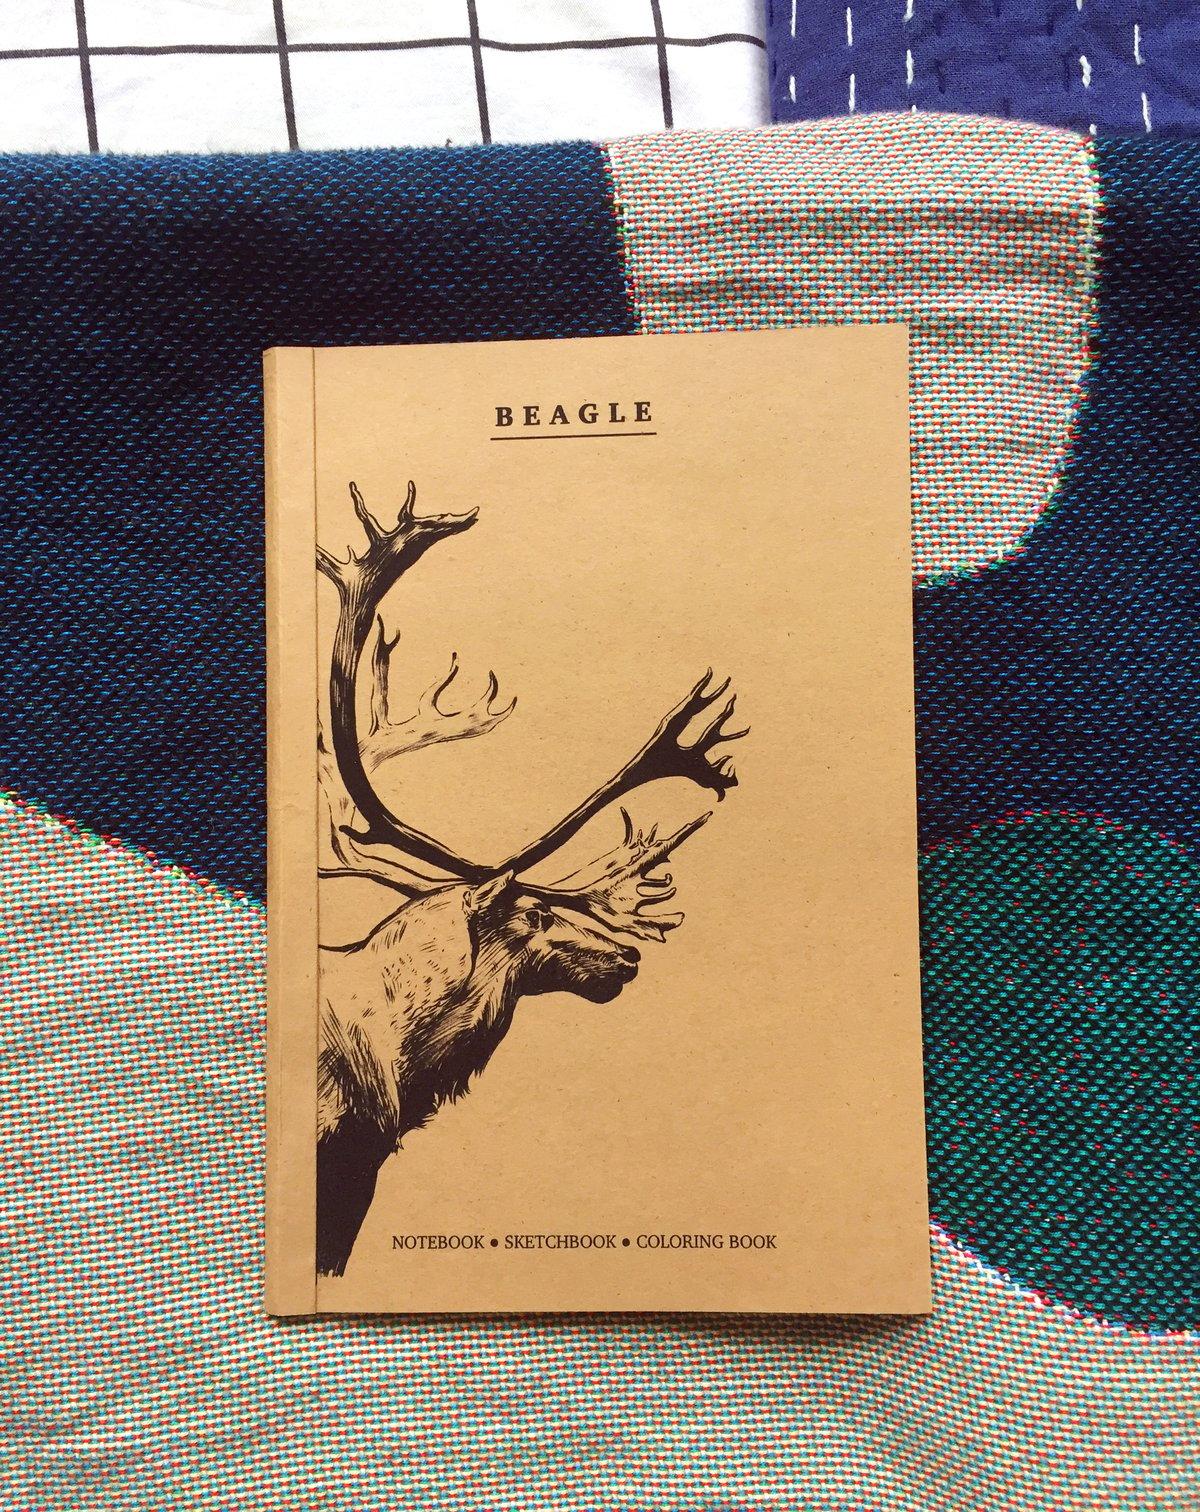 Image of Beagle Notebook